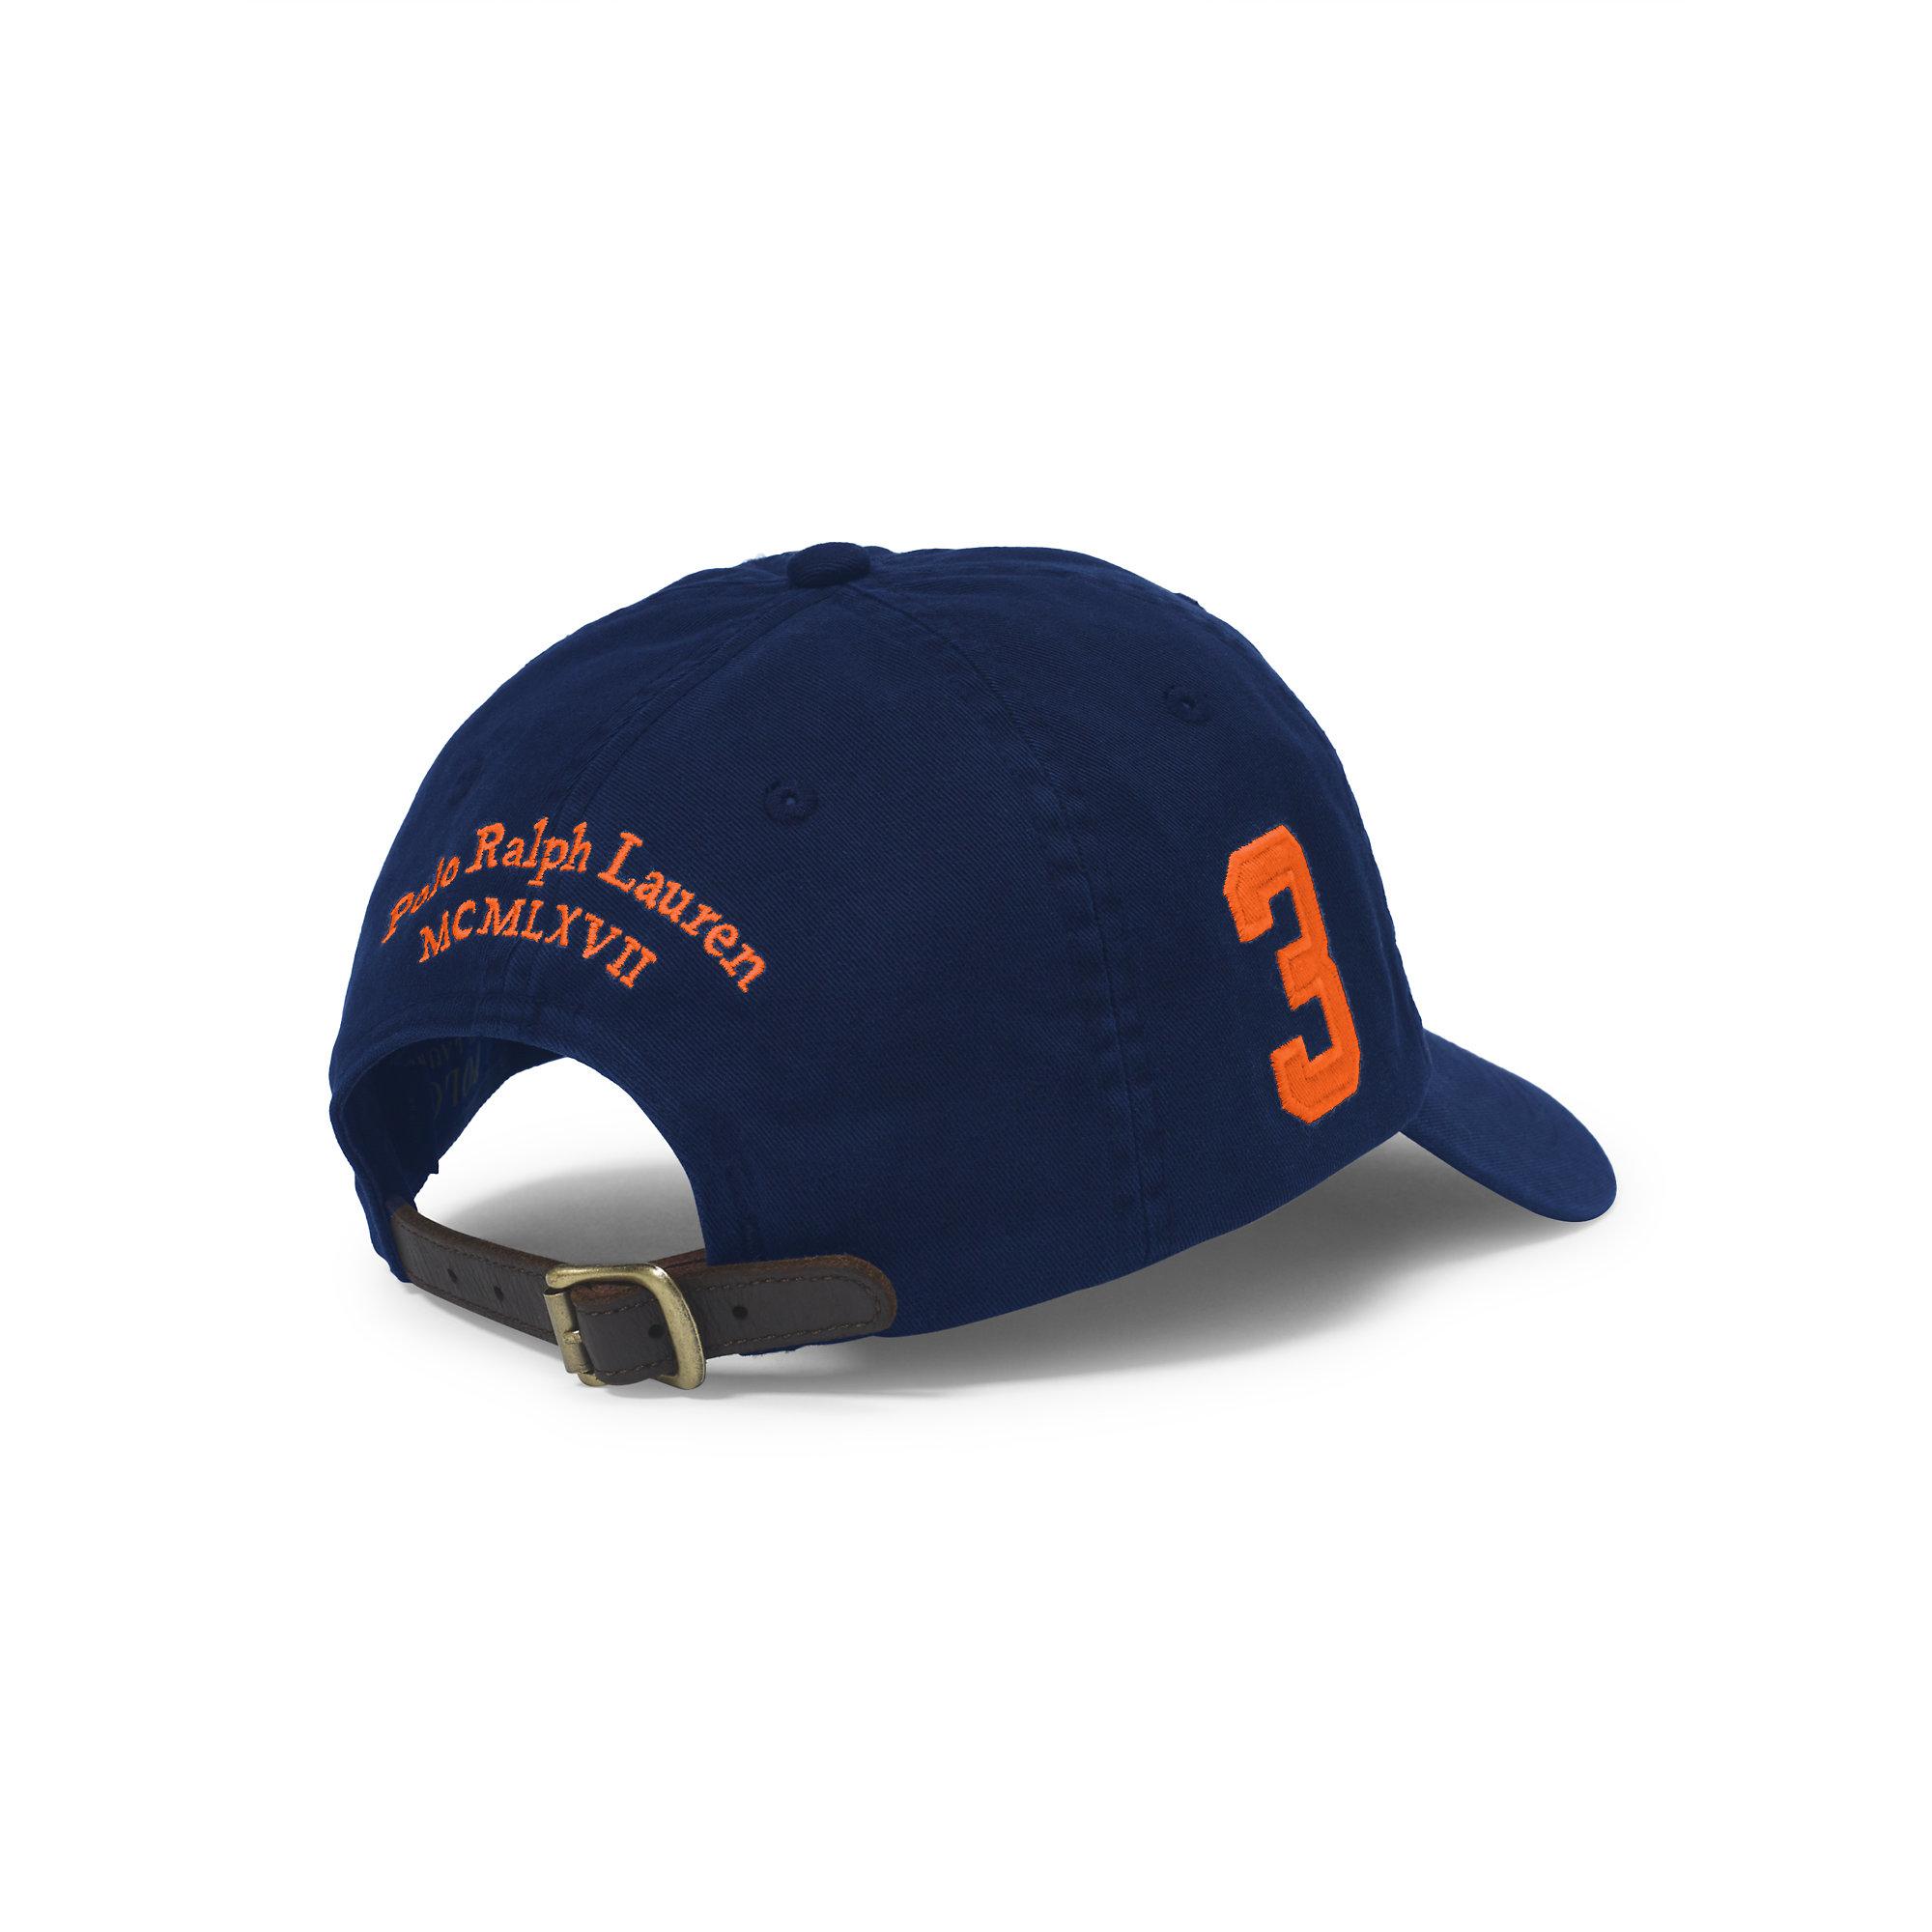 Lyst - Polo Ralph Lauren Big Pony Chino Baseball Cap in Blue for Men 47fb00de8a3